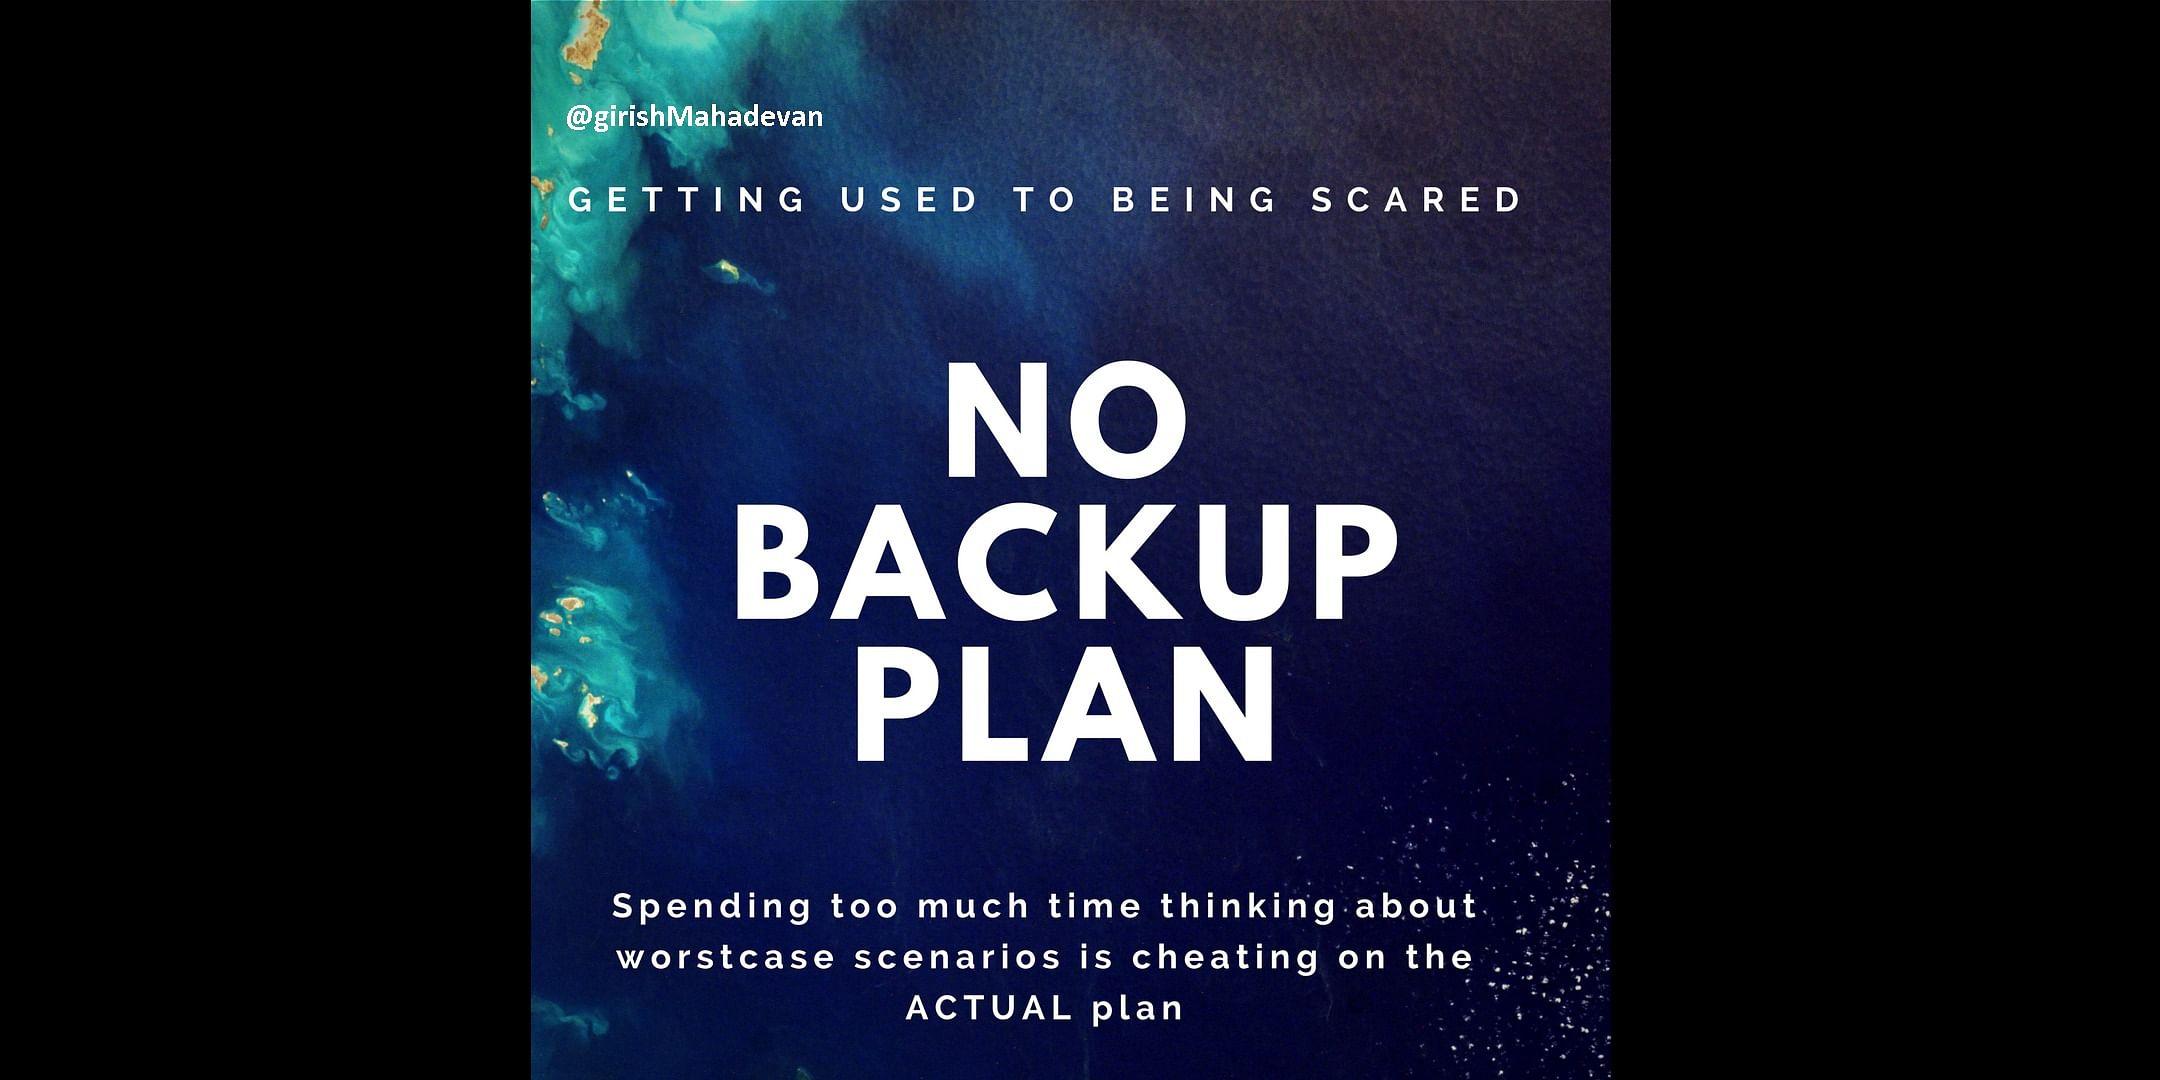 Planning the Plan B - A Graphic by Girish Mahadevan